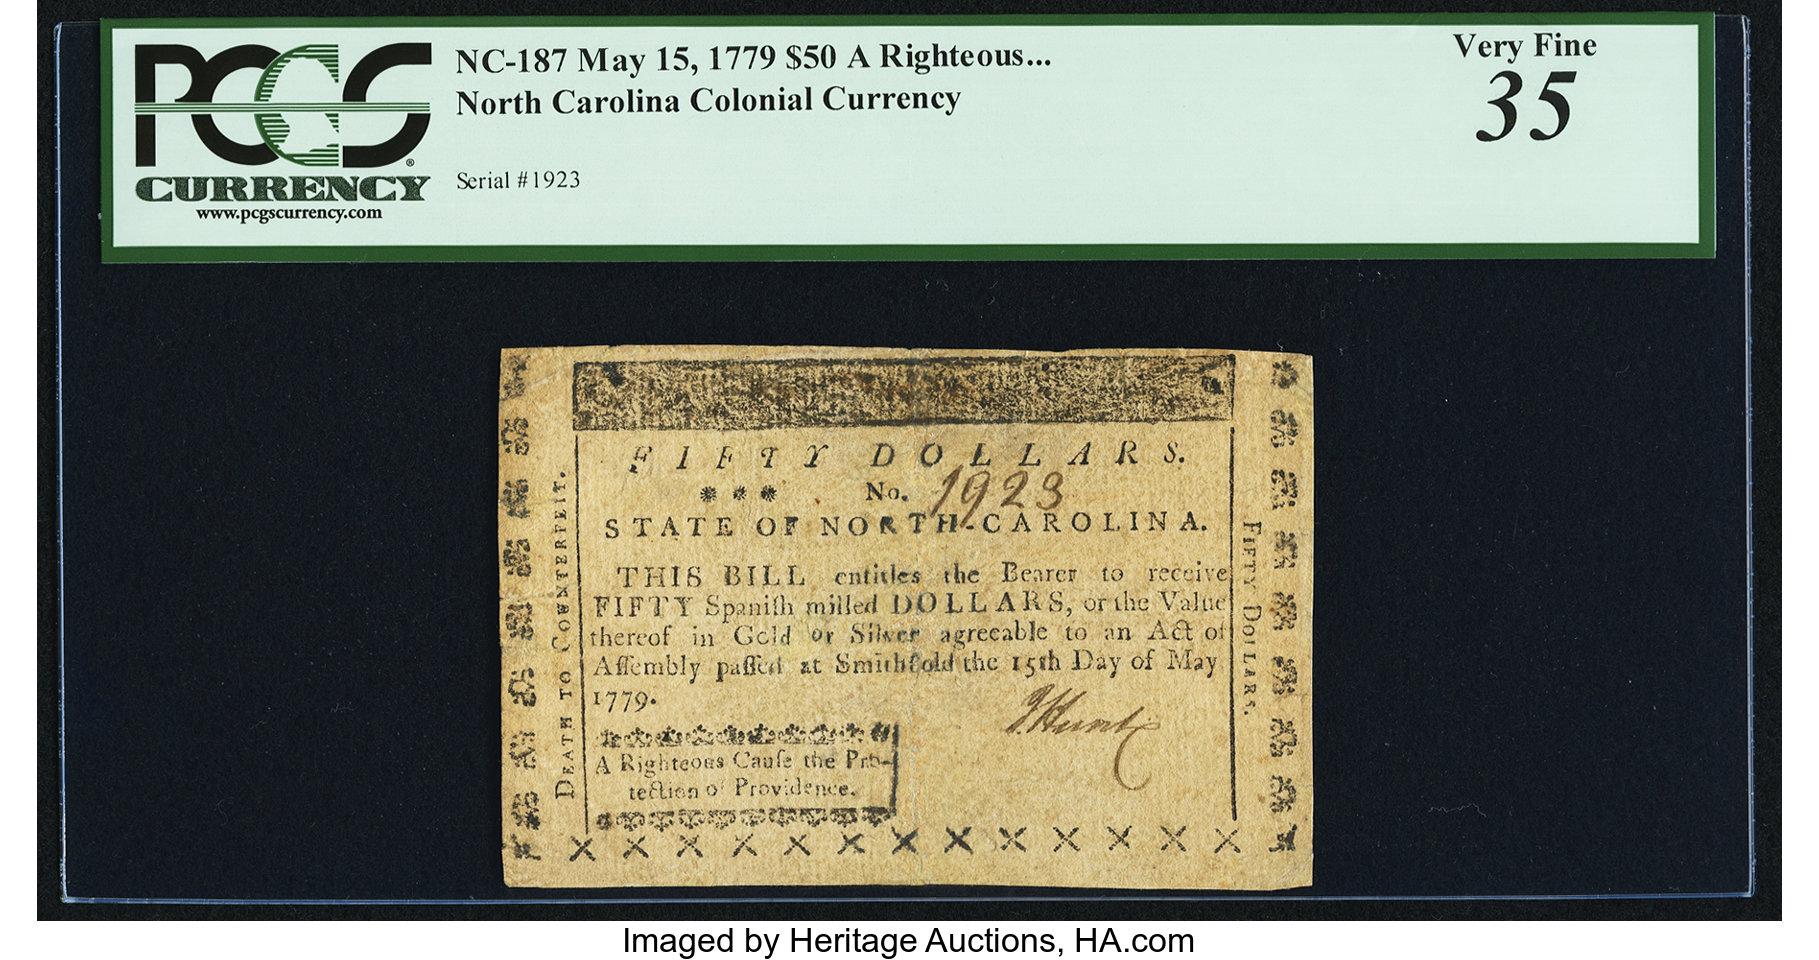 sample image for 1779 15-May $50  (Fr.# NC187)